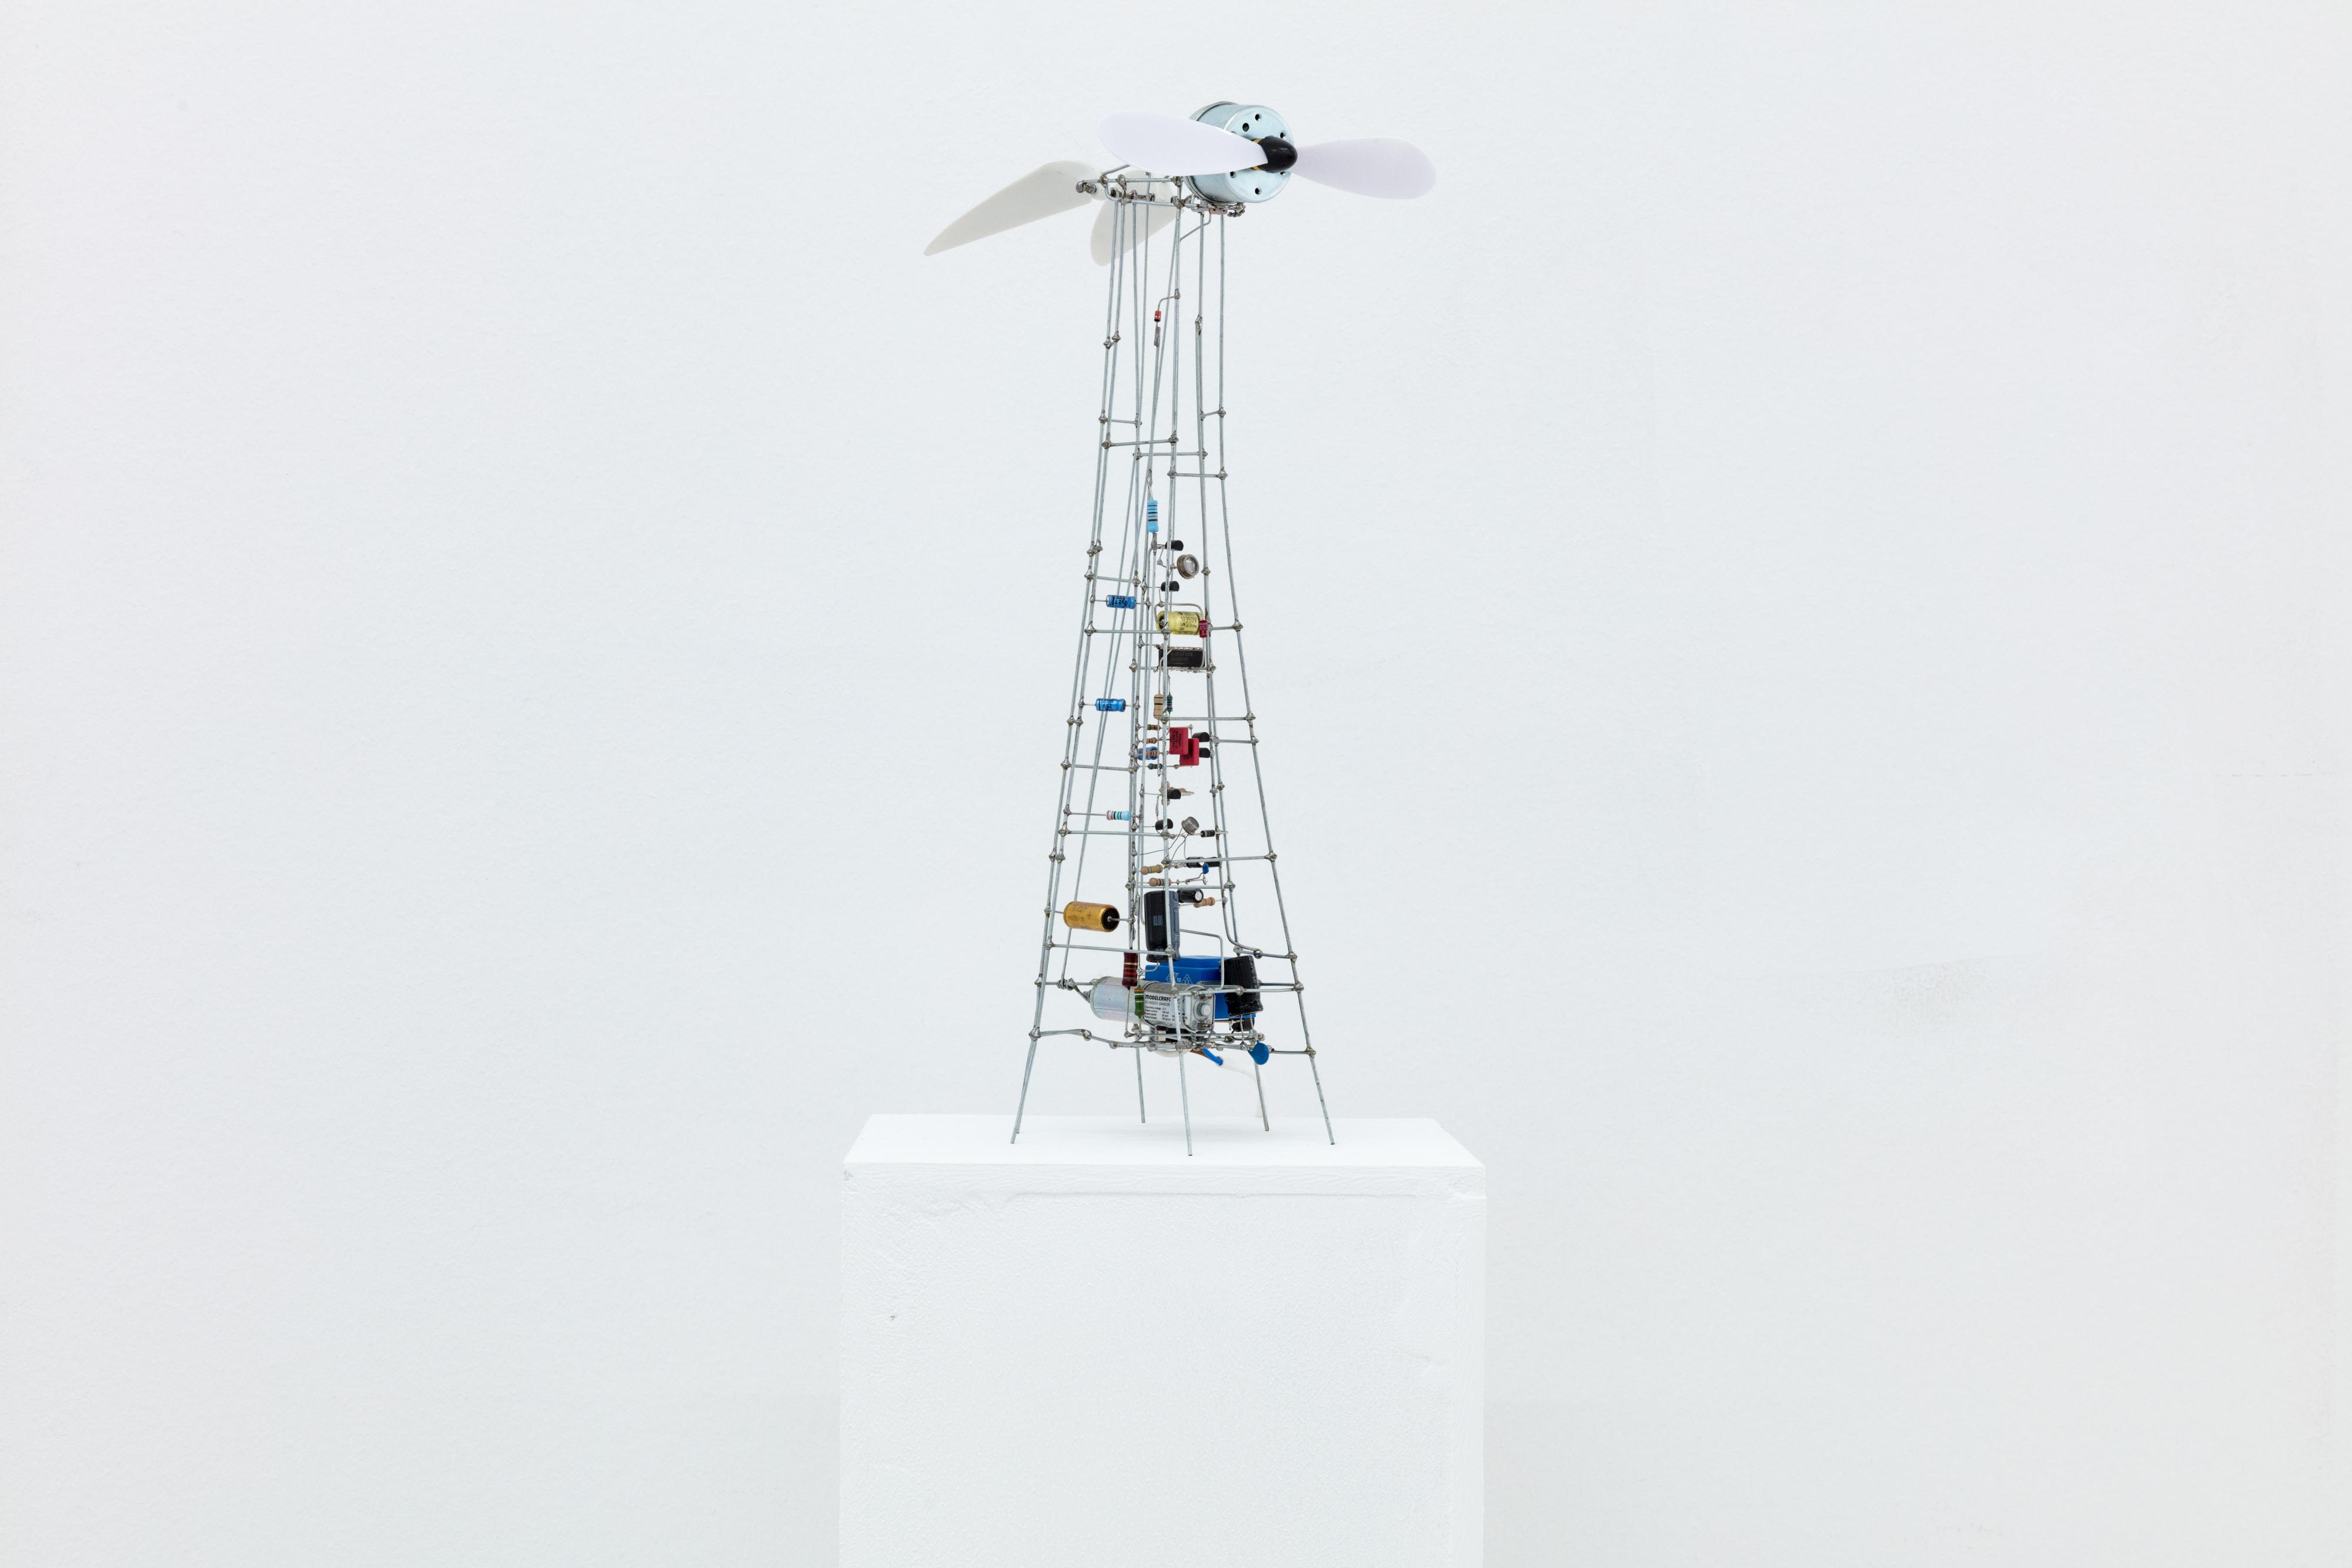 Peter Vogel, Hommage à Panamarenko, weiße Flügel, mixed Media (Bewegung), Höhe: 42 cm, 2010